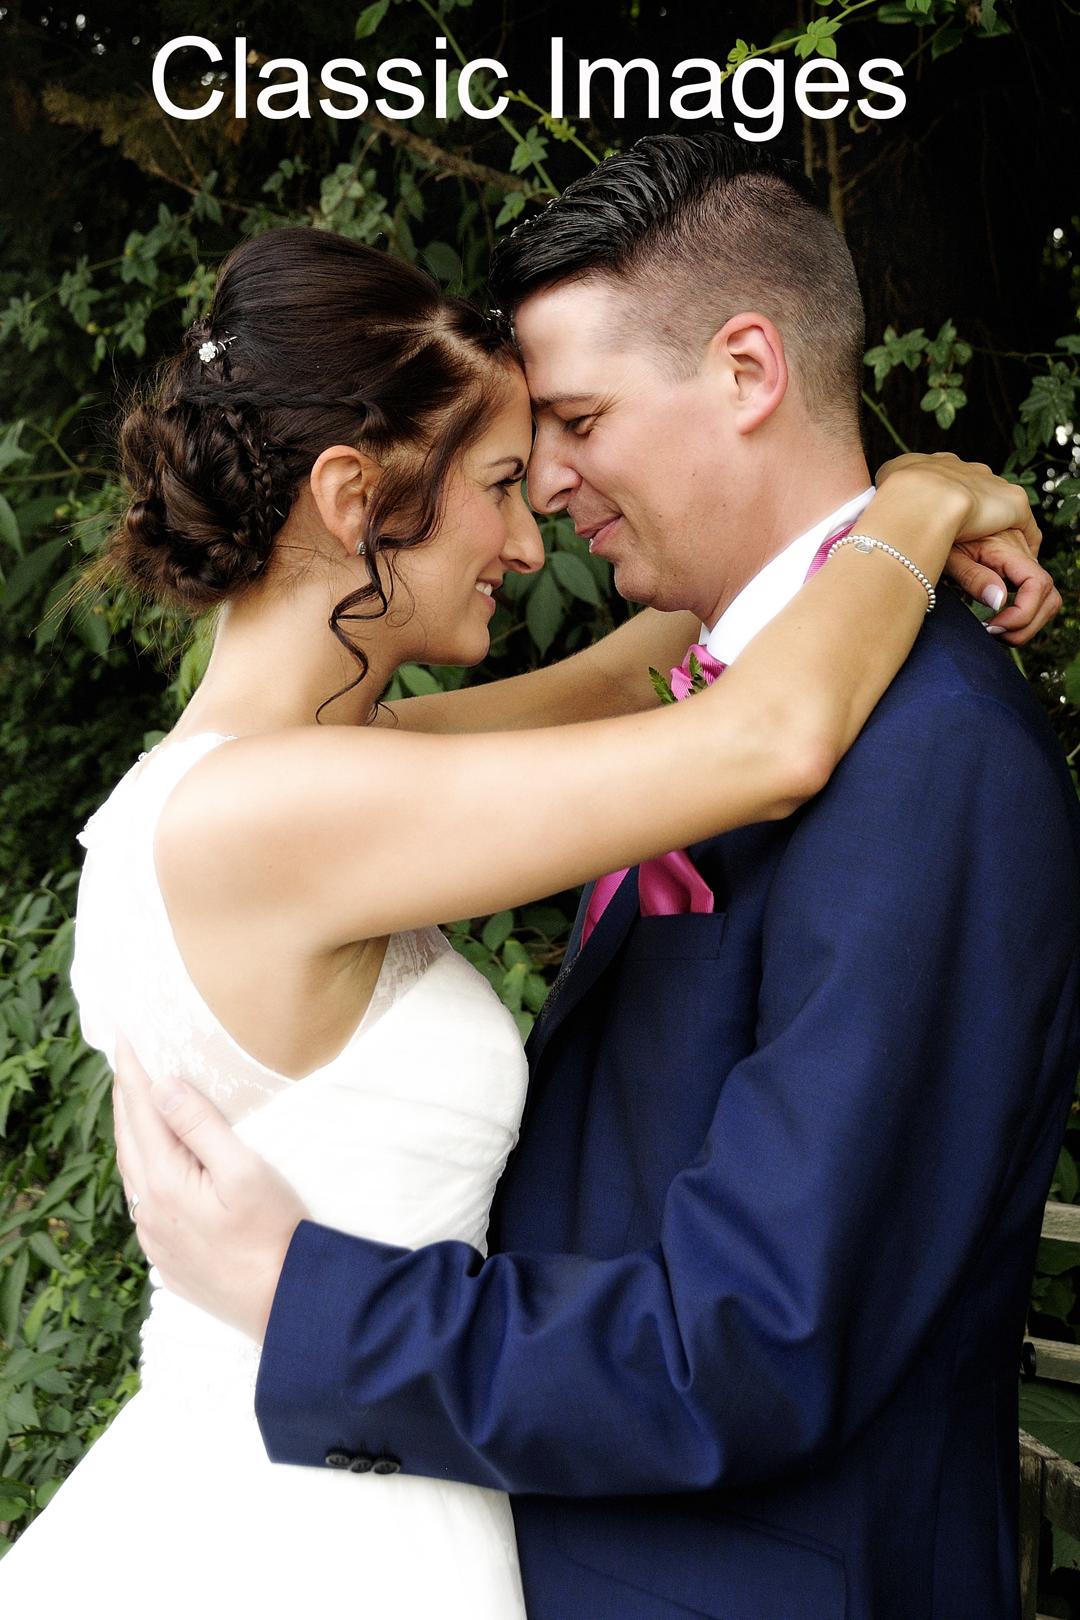 classic-cute-romantic-wedding-photograph